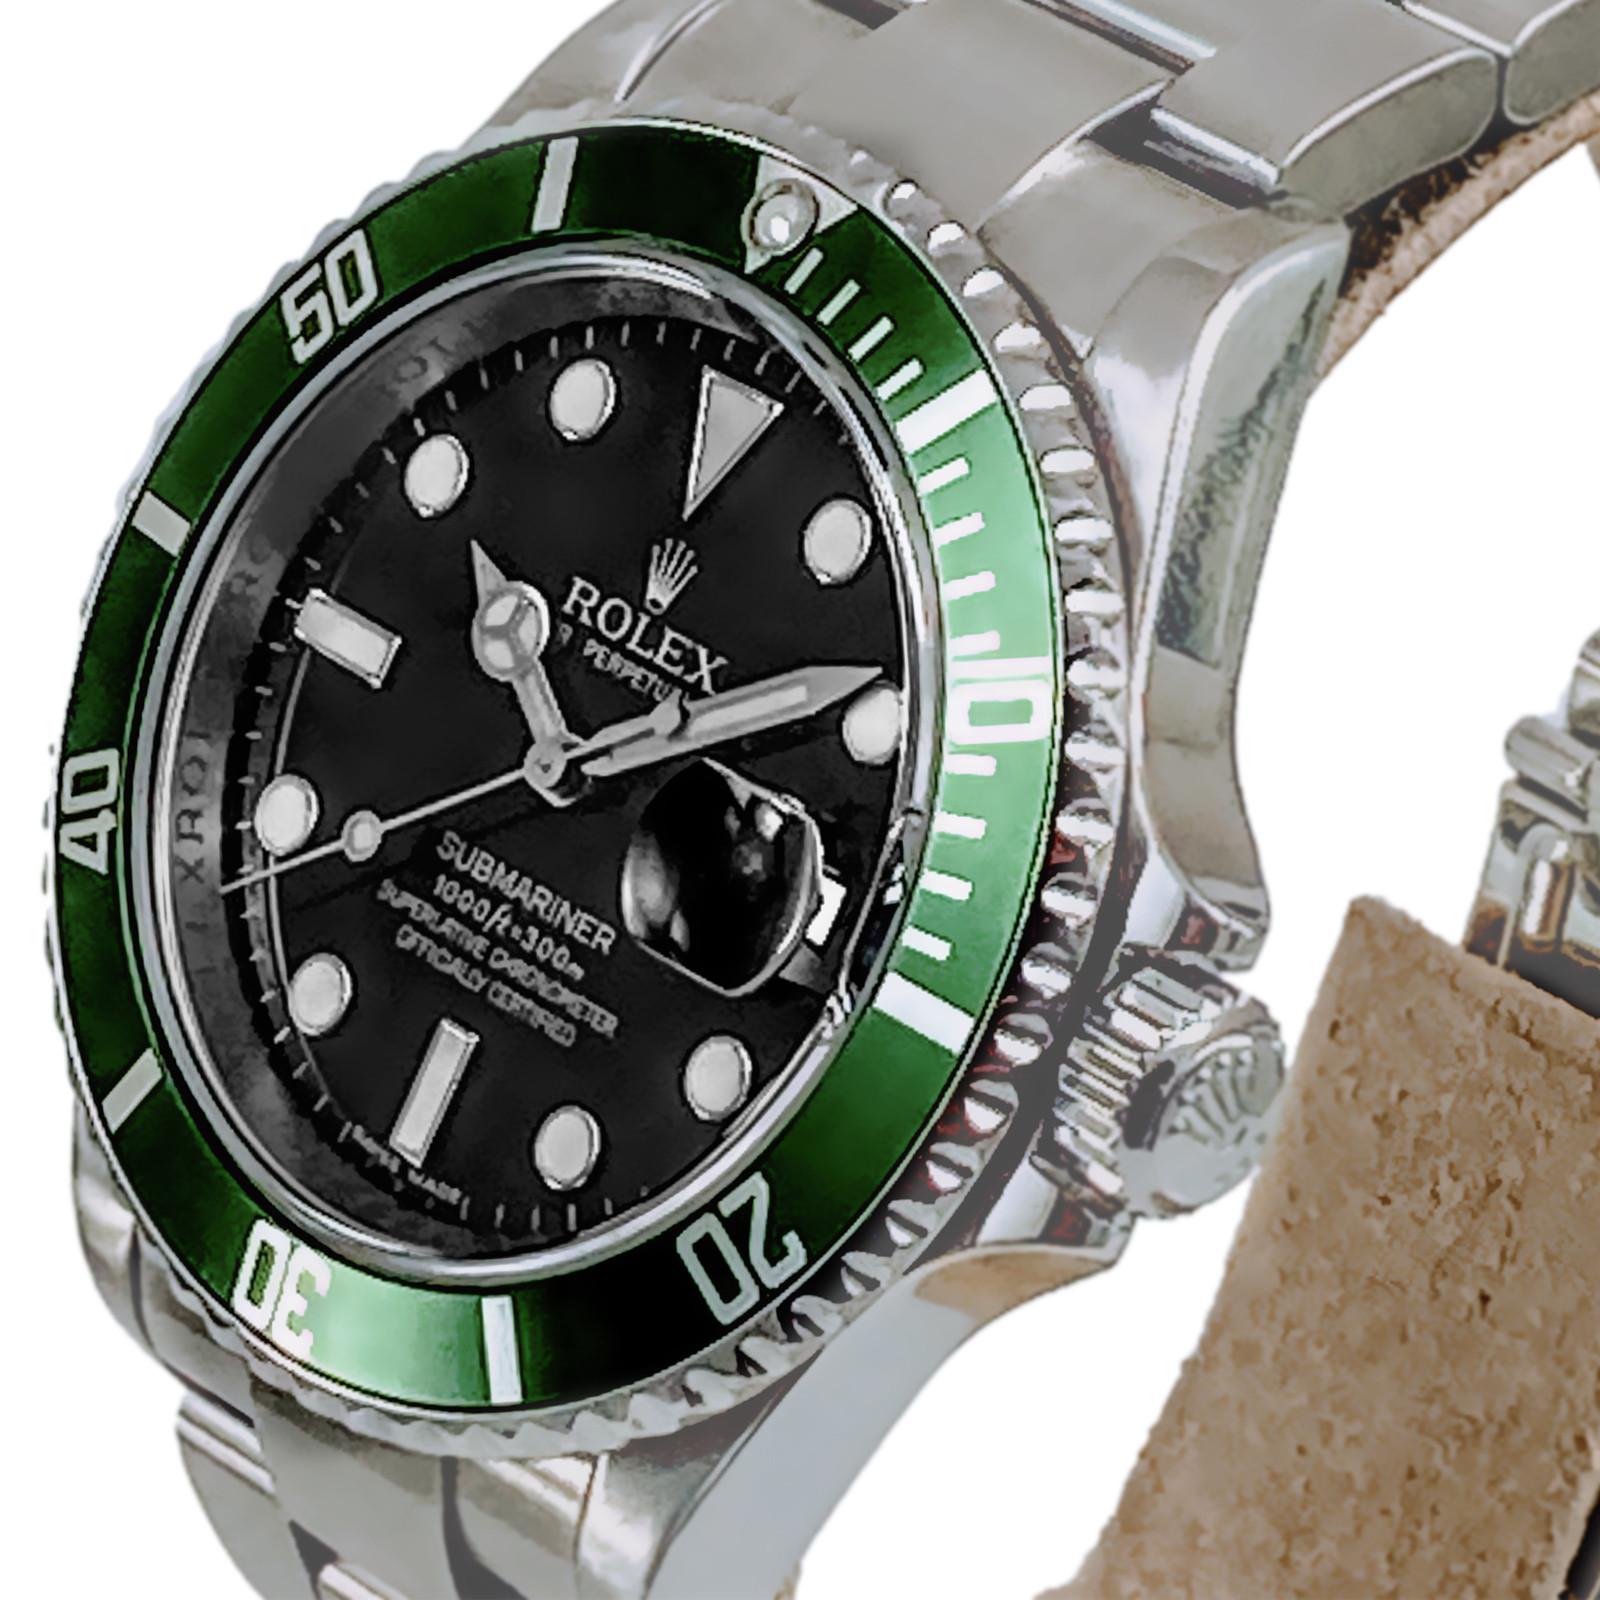 Rolex 16610LV Anniversary Submariner